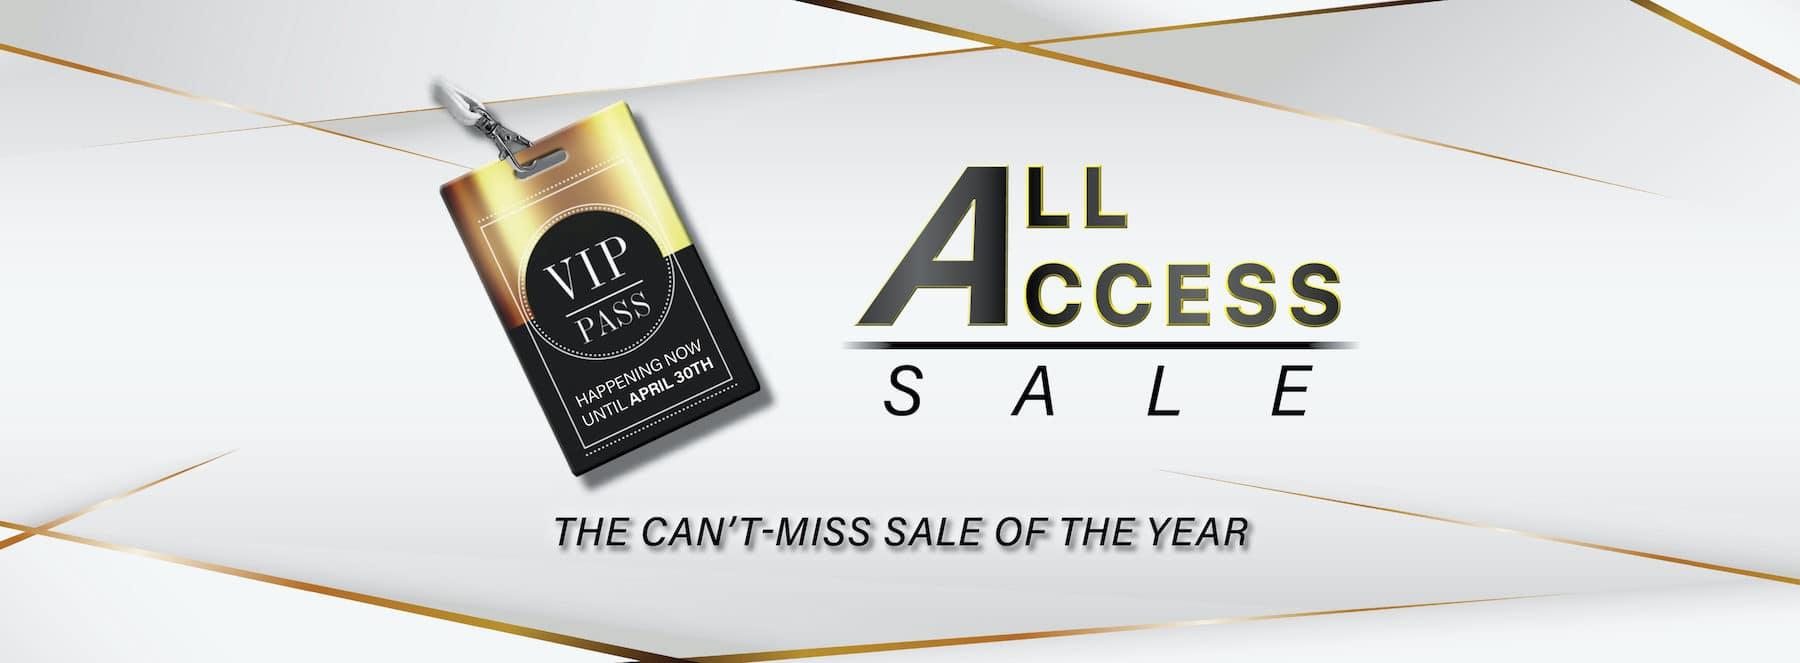 VIP All Access